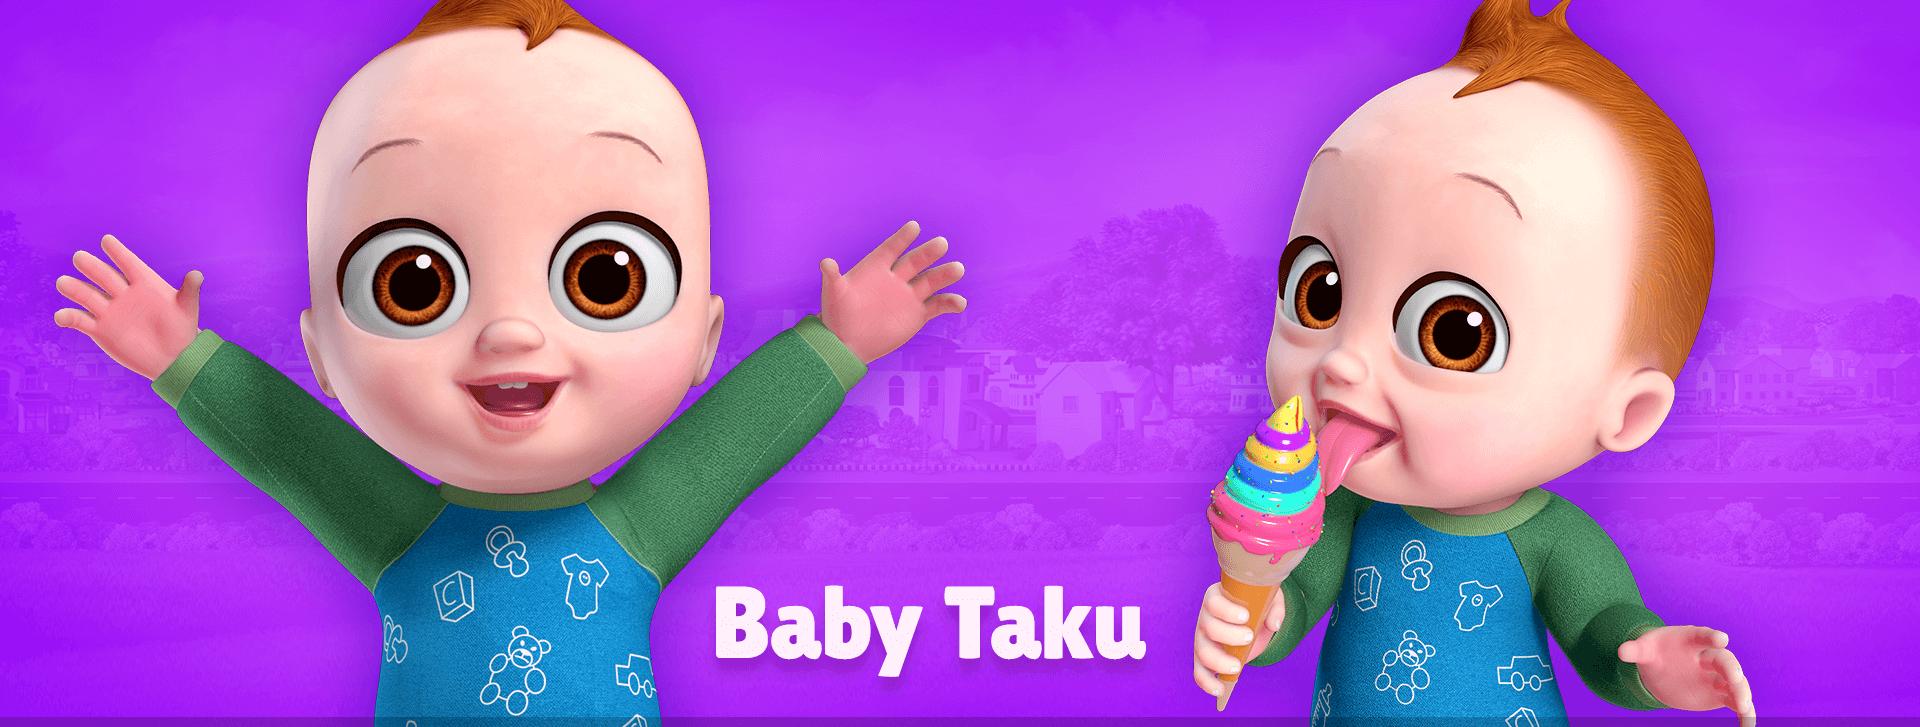 Baby Taku